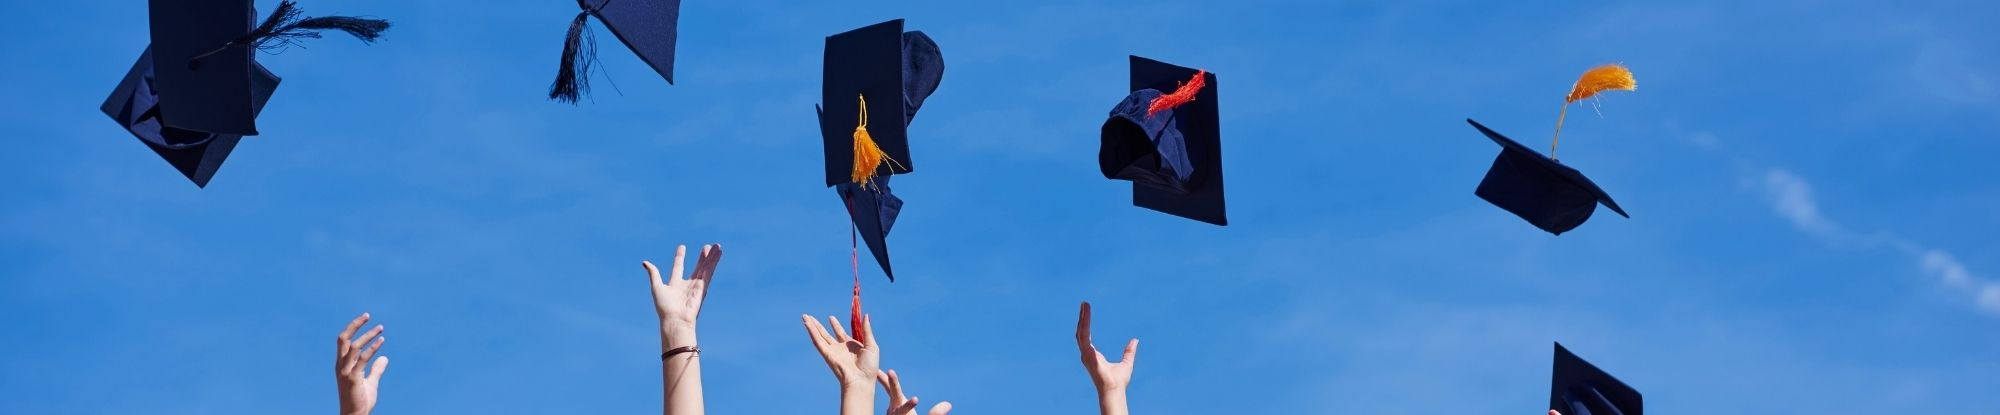 Graduate Testimonials & Reviews | Mentorship Program | Online Nutrition Training Course & Diplomas | Edison Institute of Nutrition